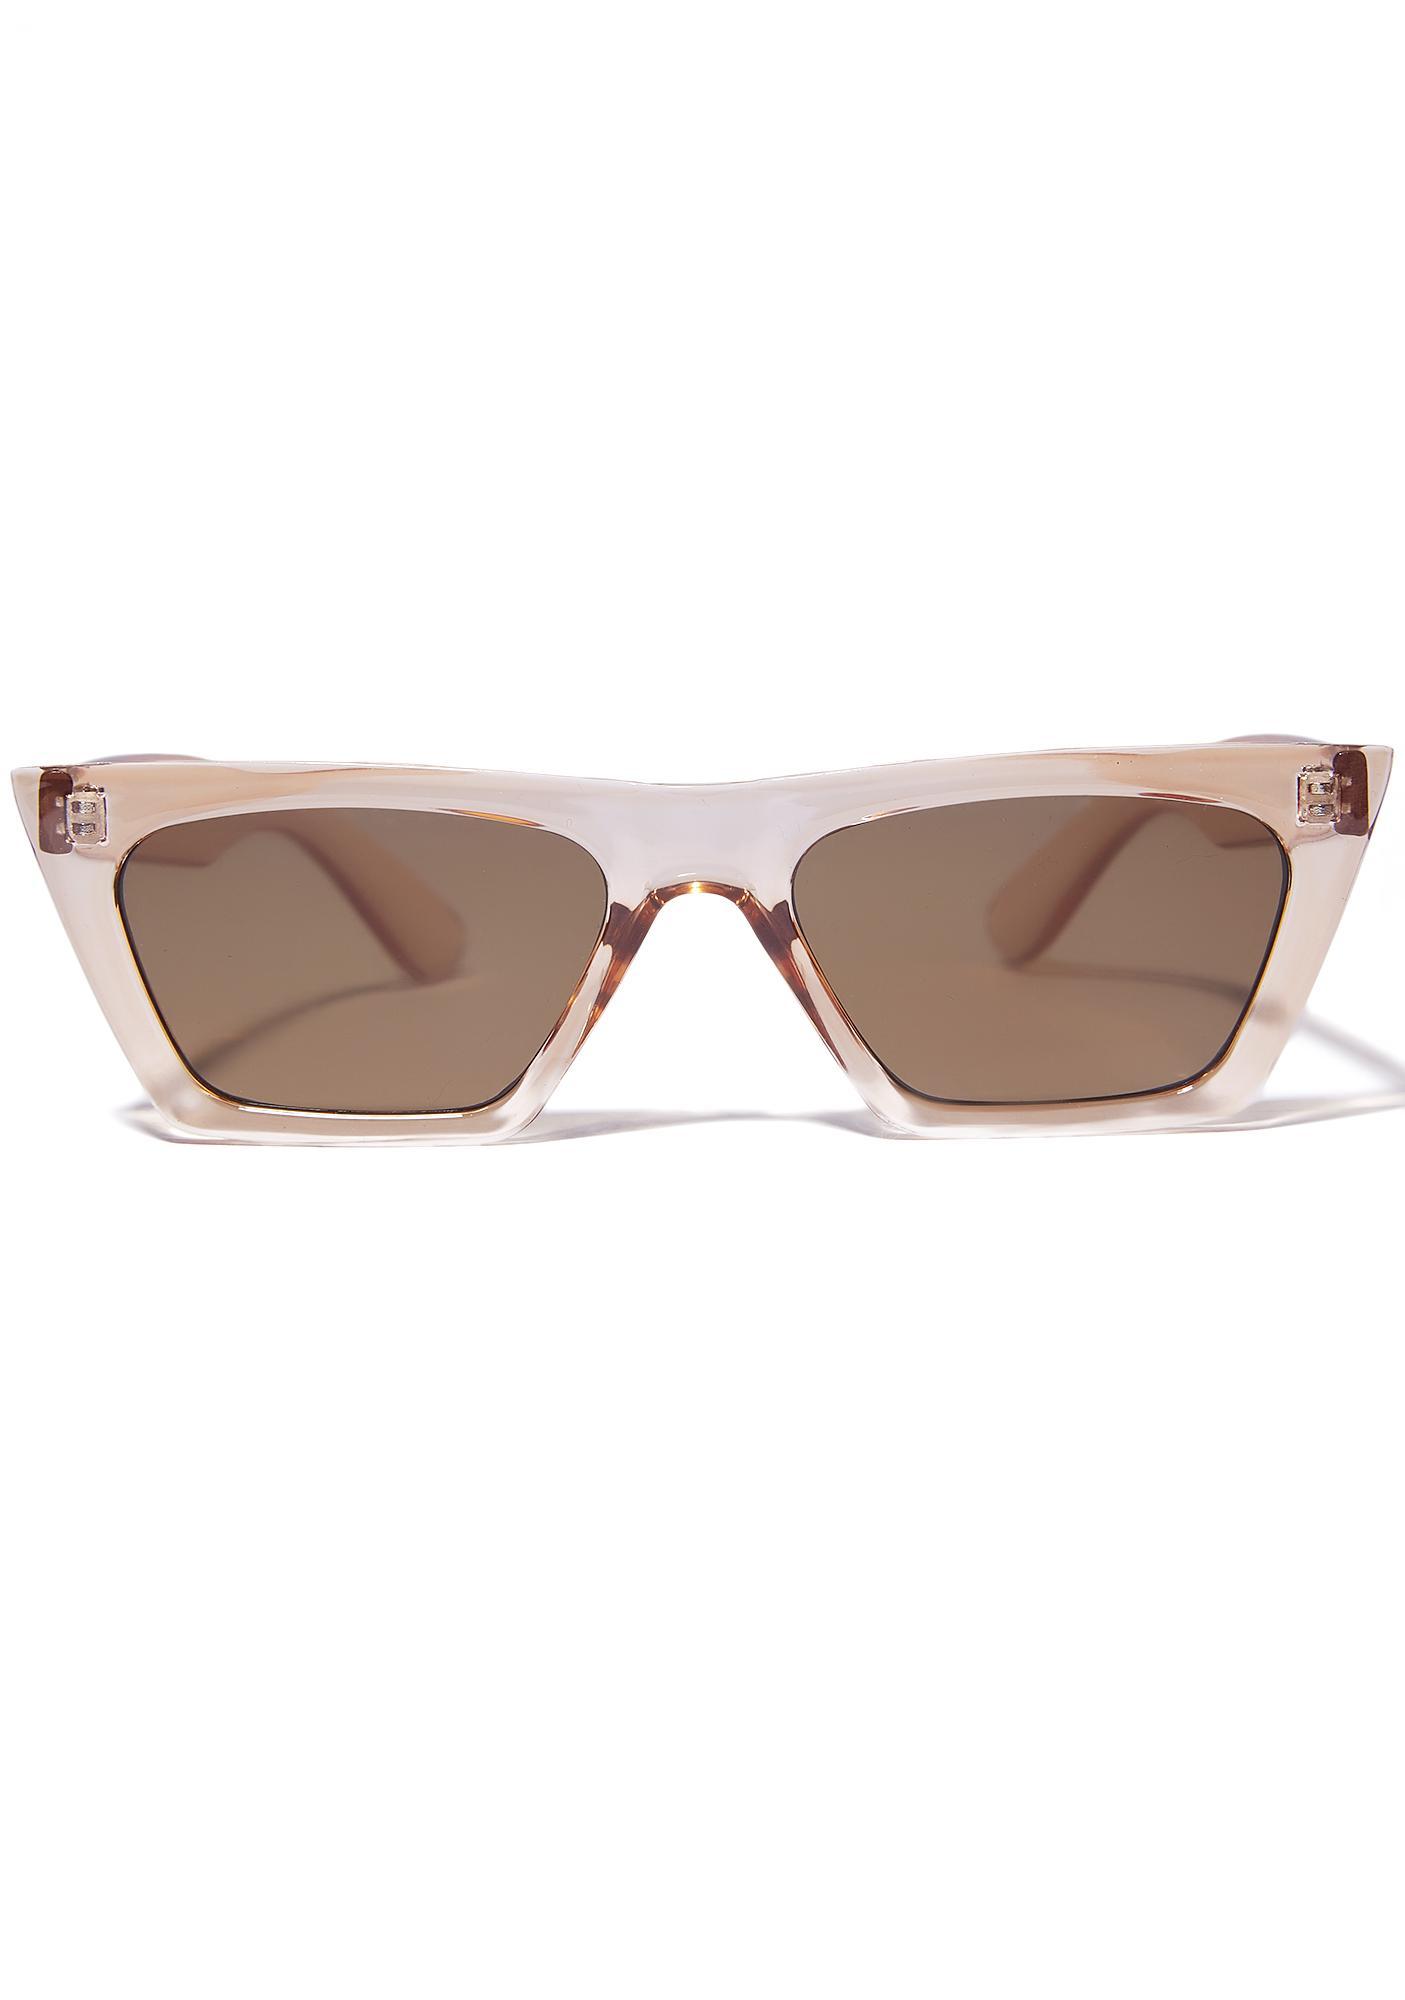 Beam Me Up Sunglasses